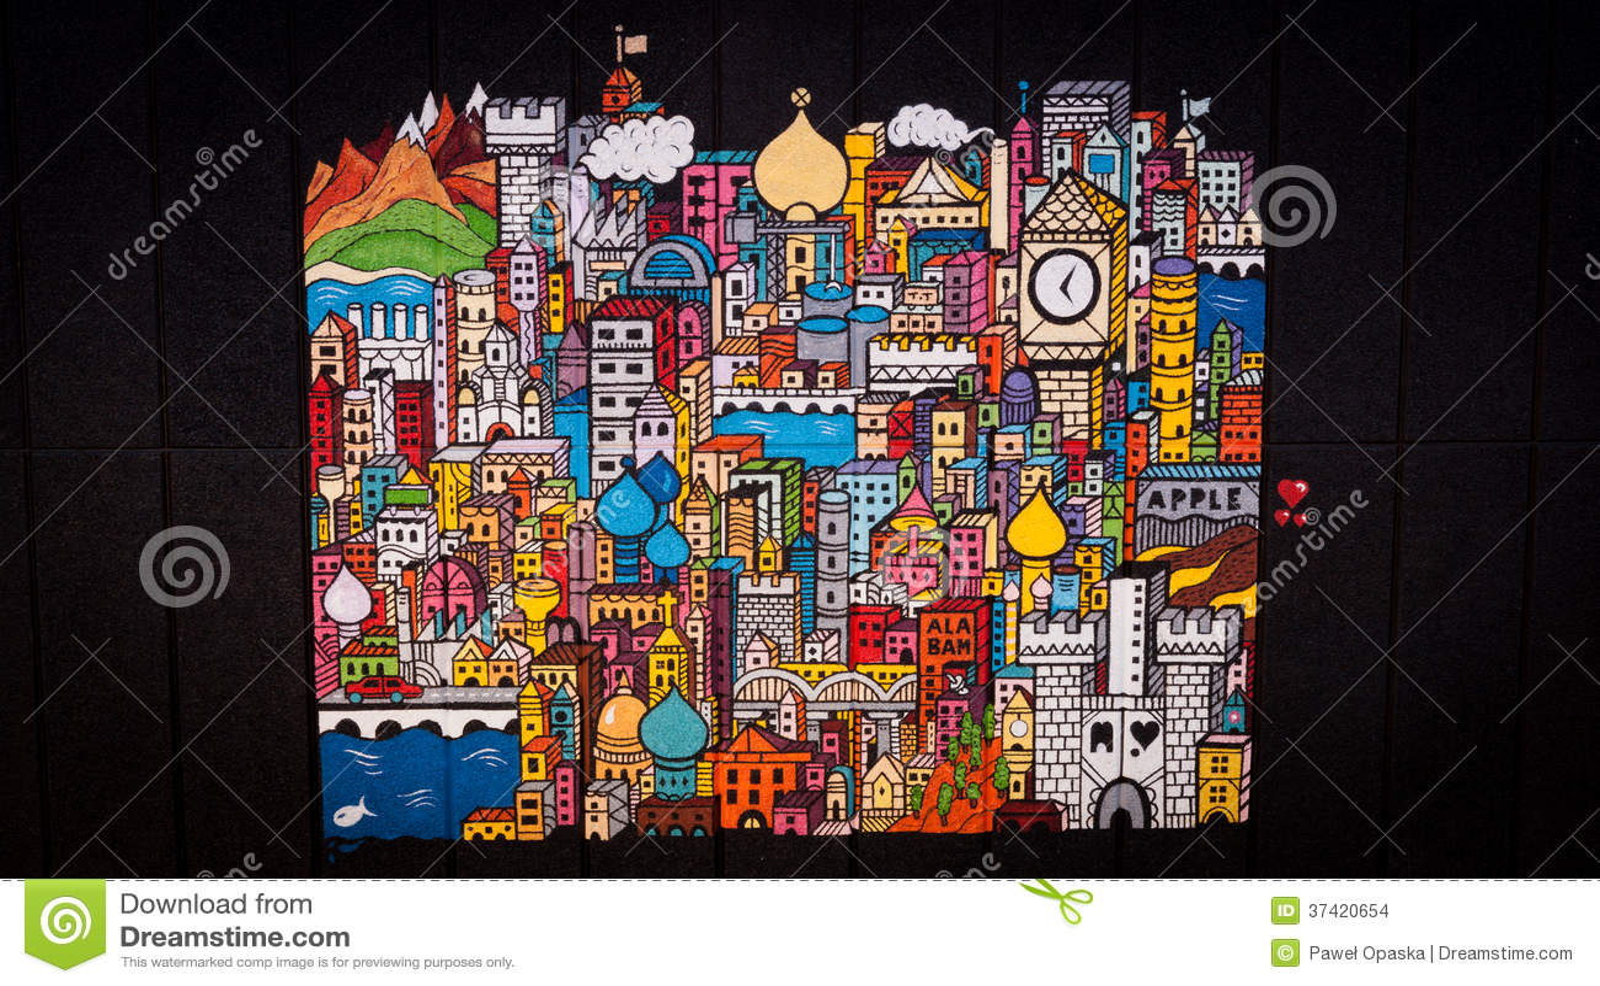 London Wall Art london wall art editorial stock image - image: 37420654